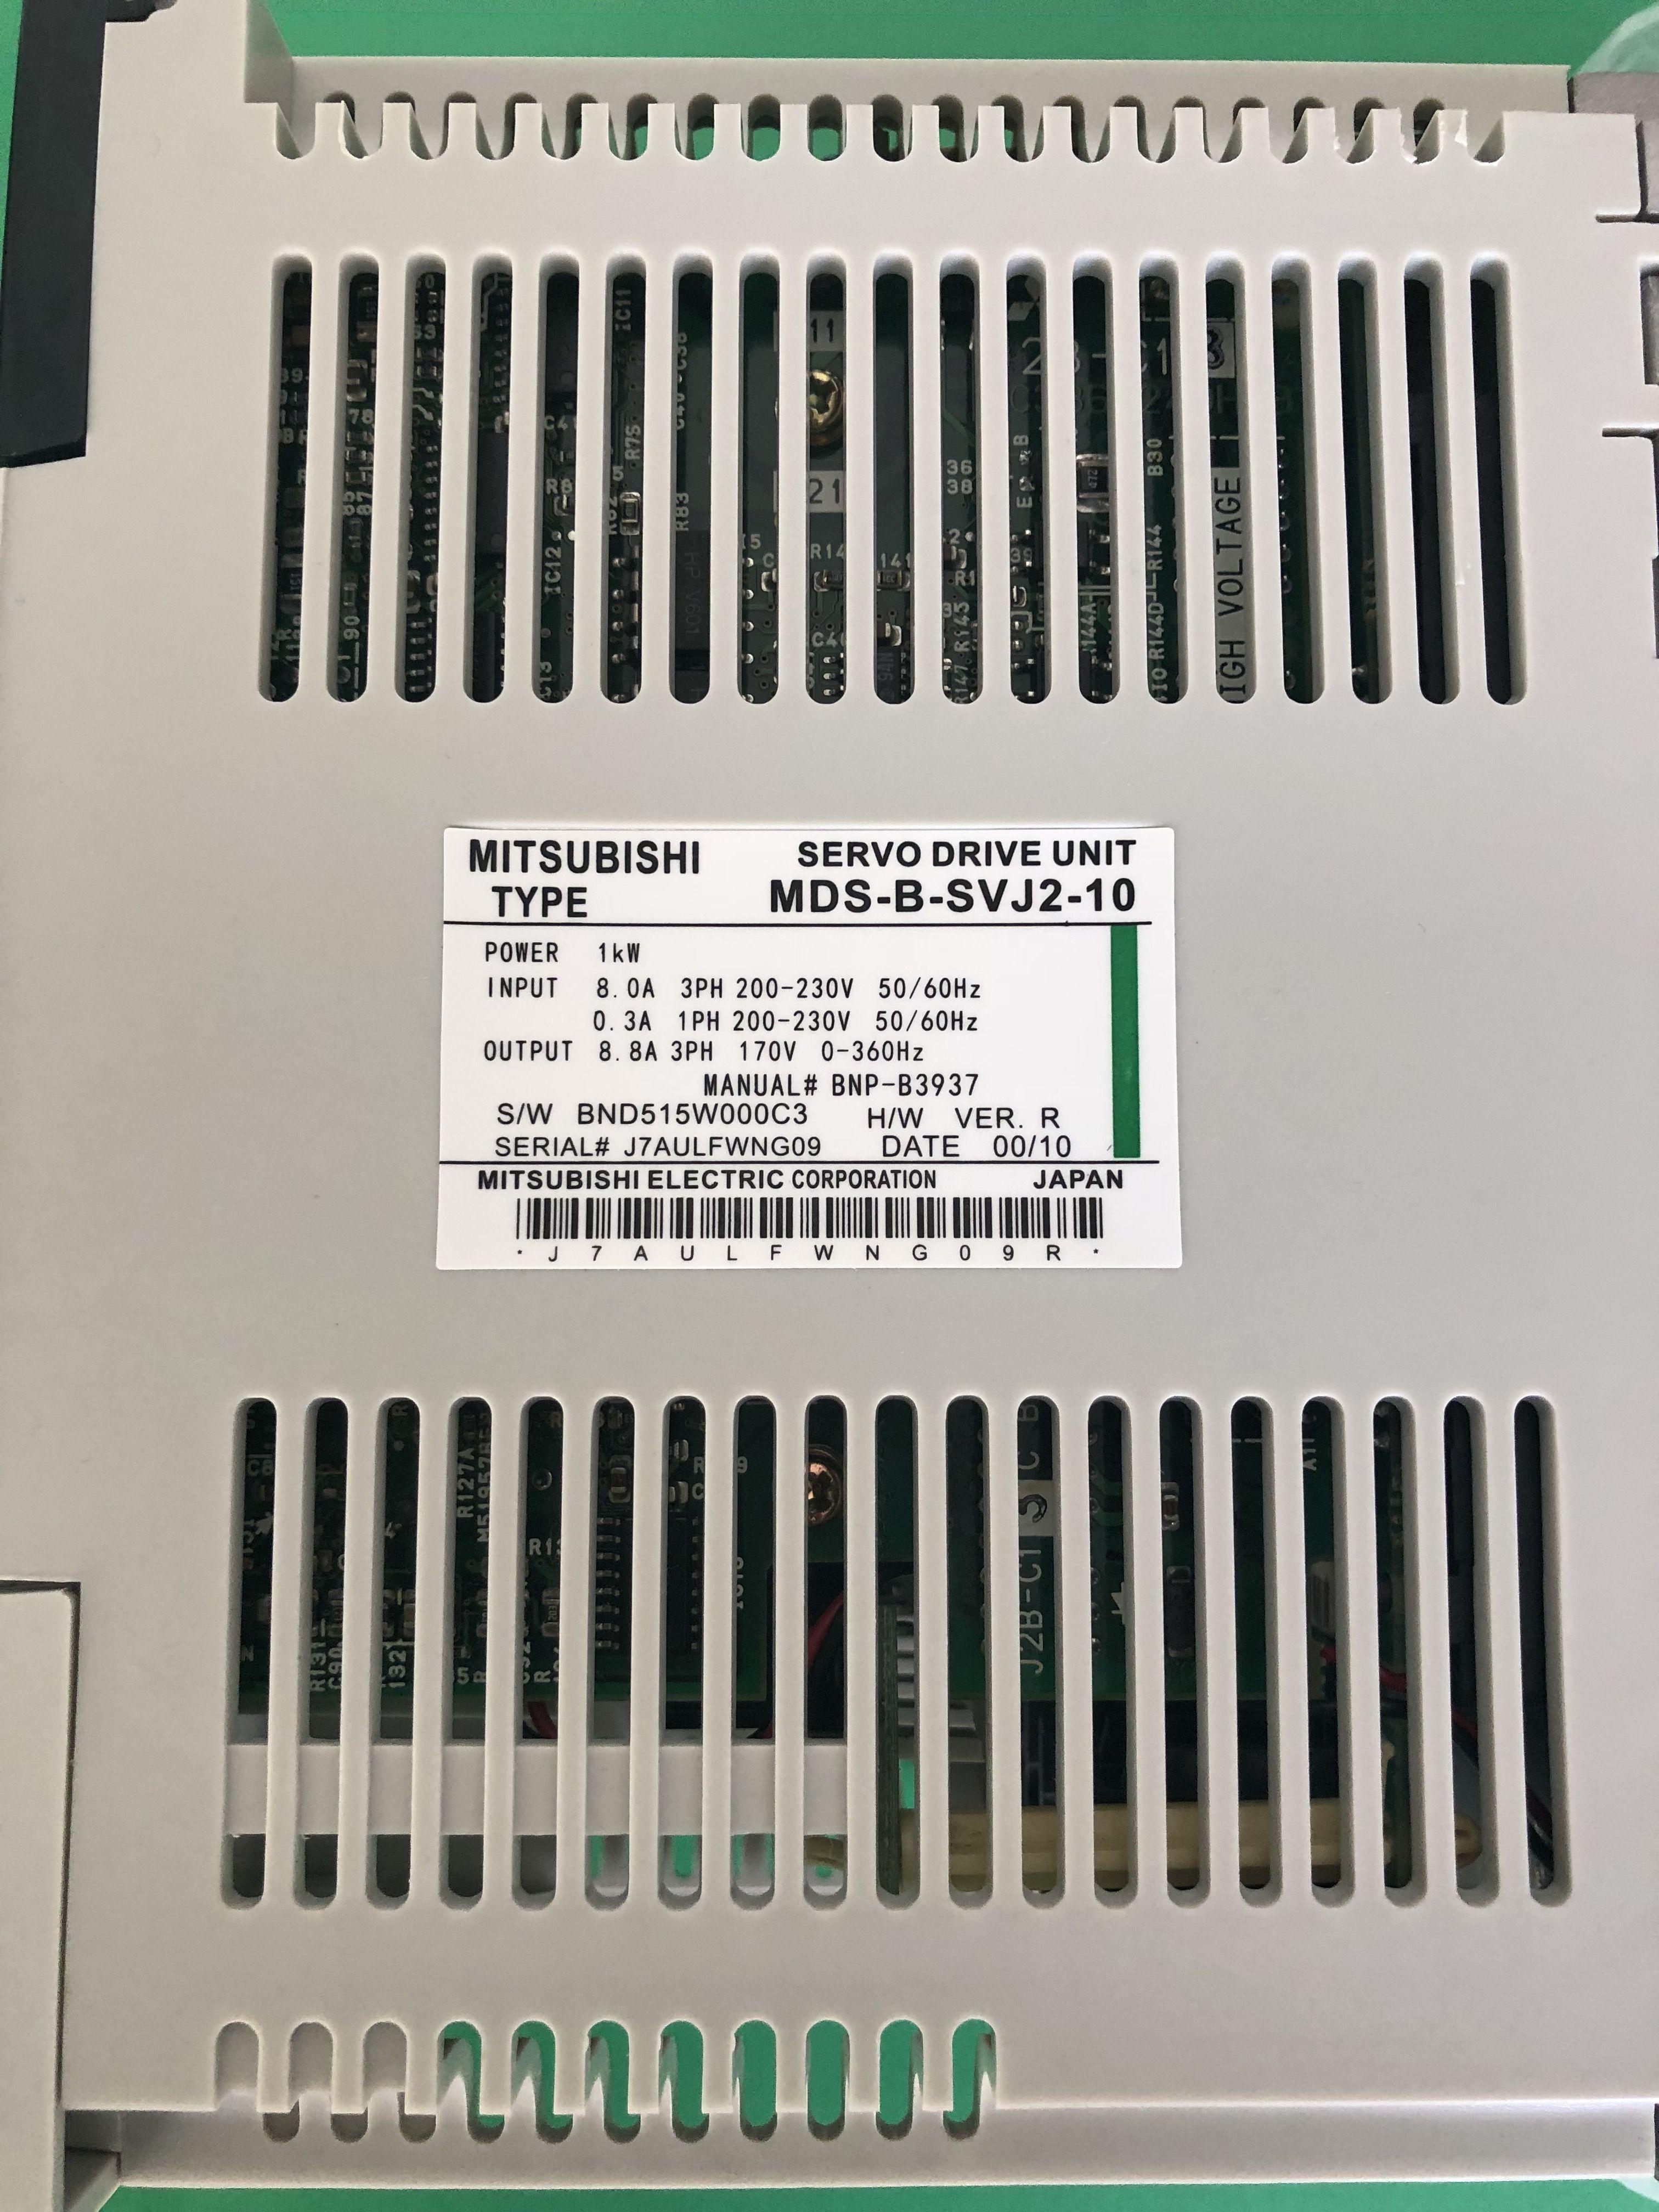 2019 One Mitsubishi Servo Drive MDS B SVJ2 10 Used Test OK Free Expedited  Shipping From Thirteenjiang, &Price